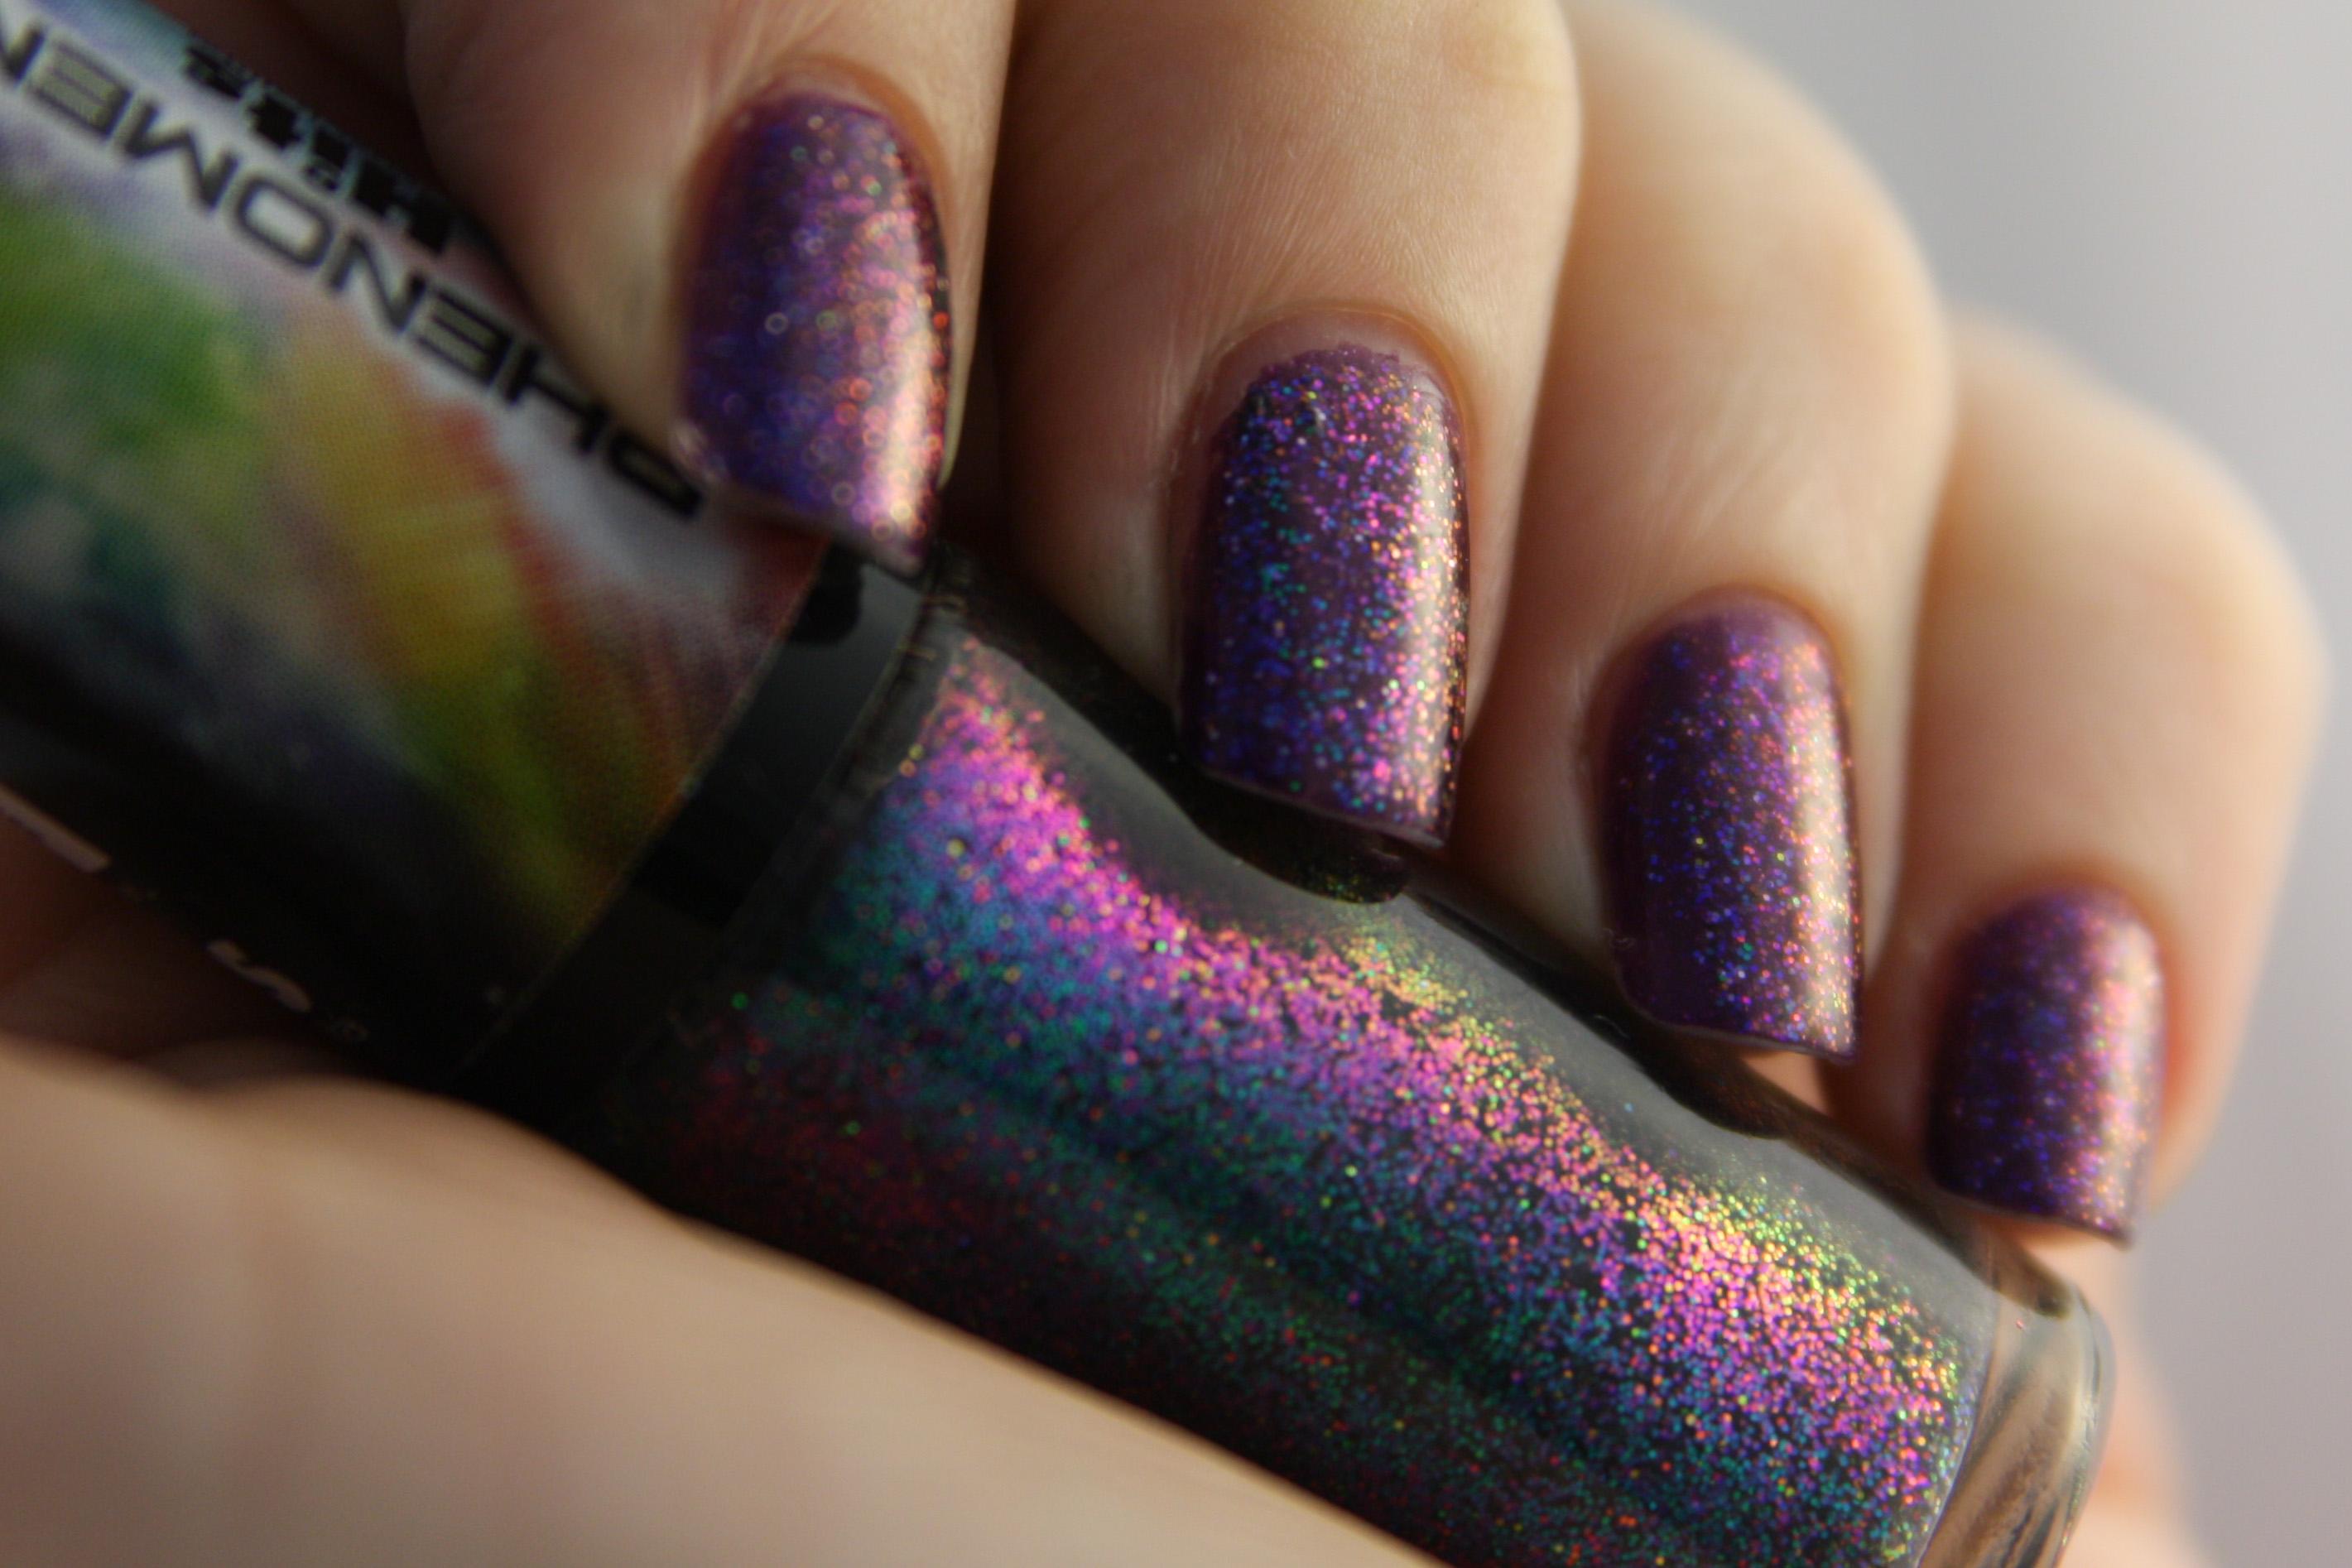 File:Glitter nail polish (purple).jpg - Wikimedia Commons